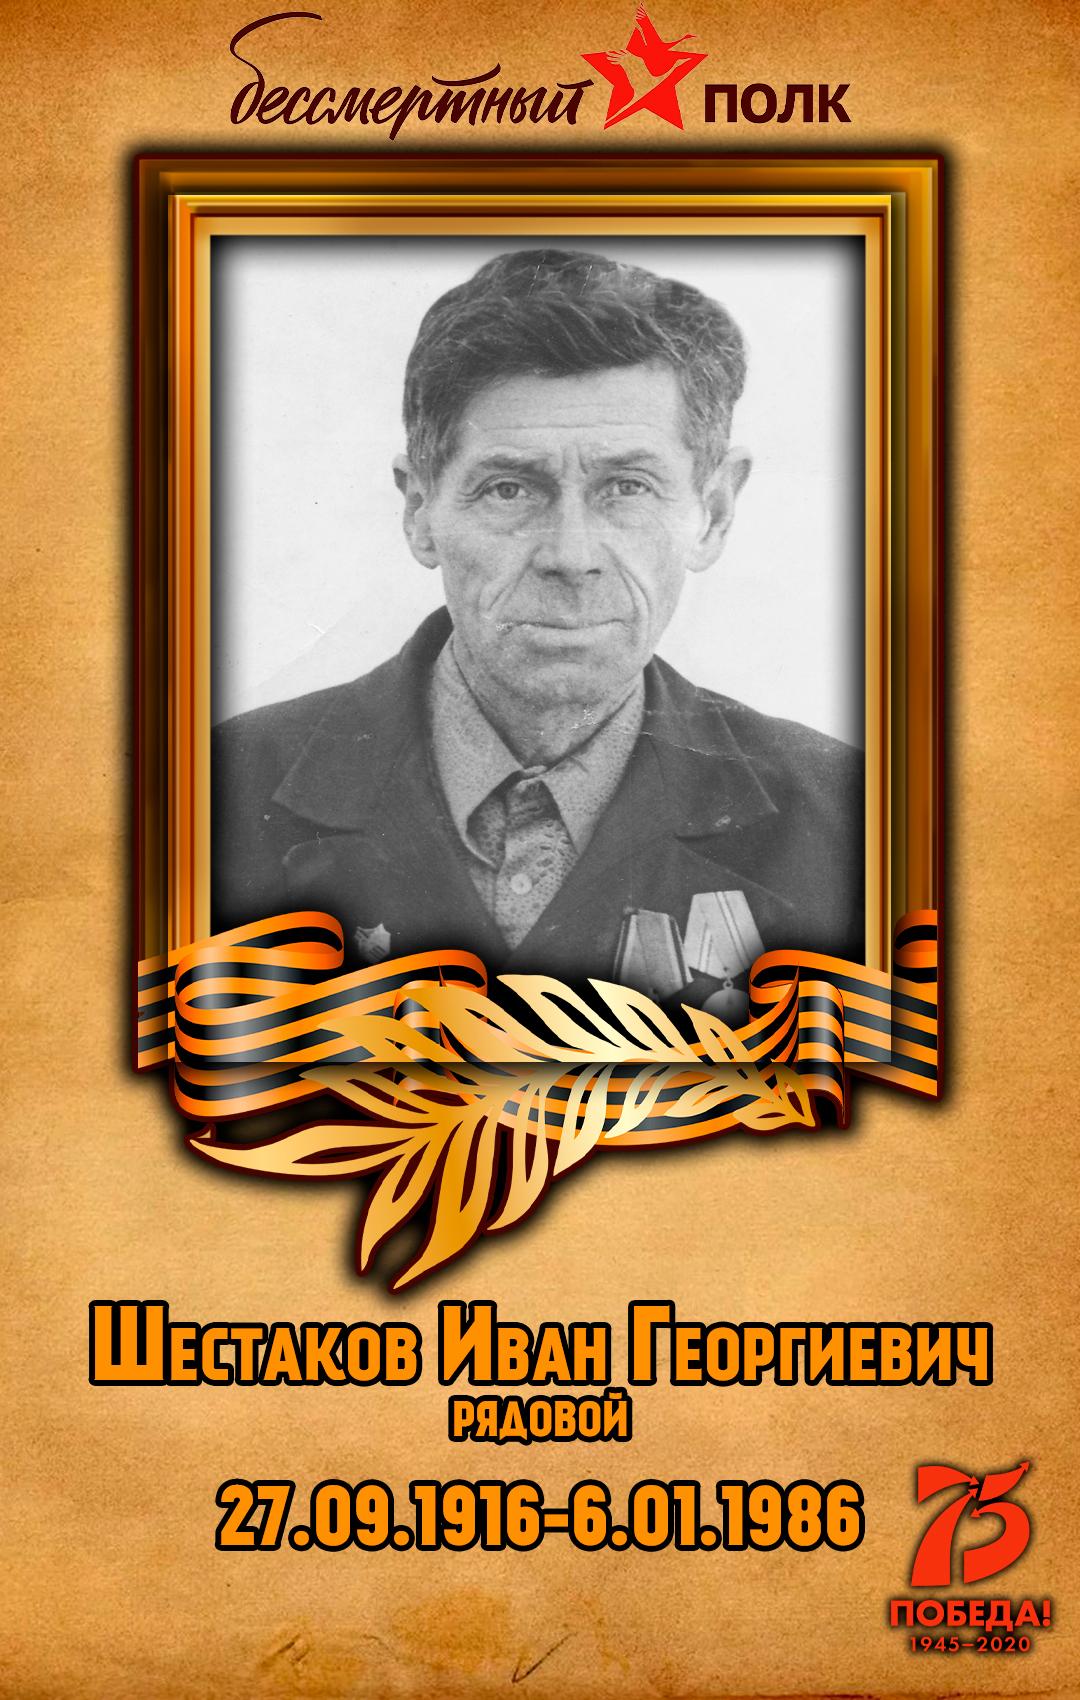 Шестаков-Иван-Георгиевич